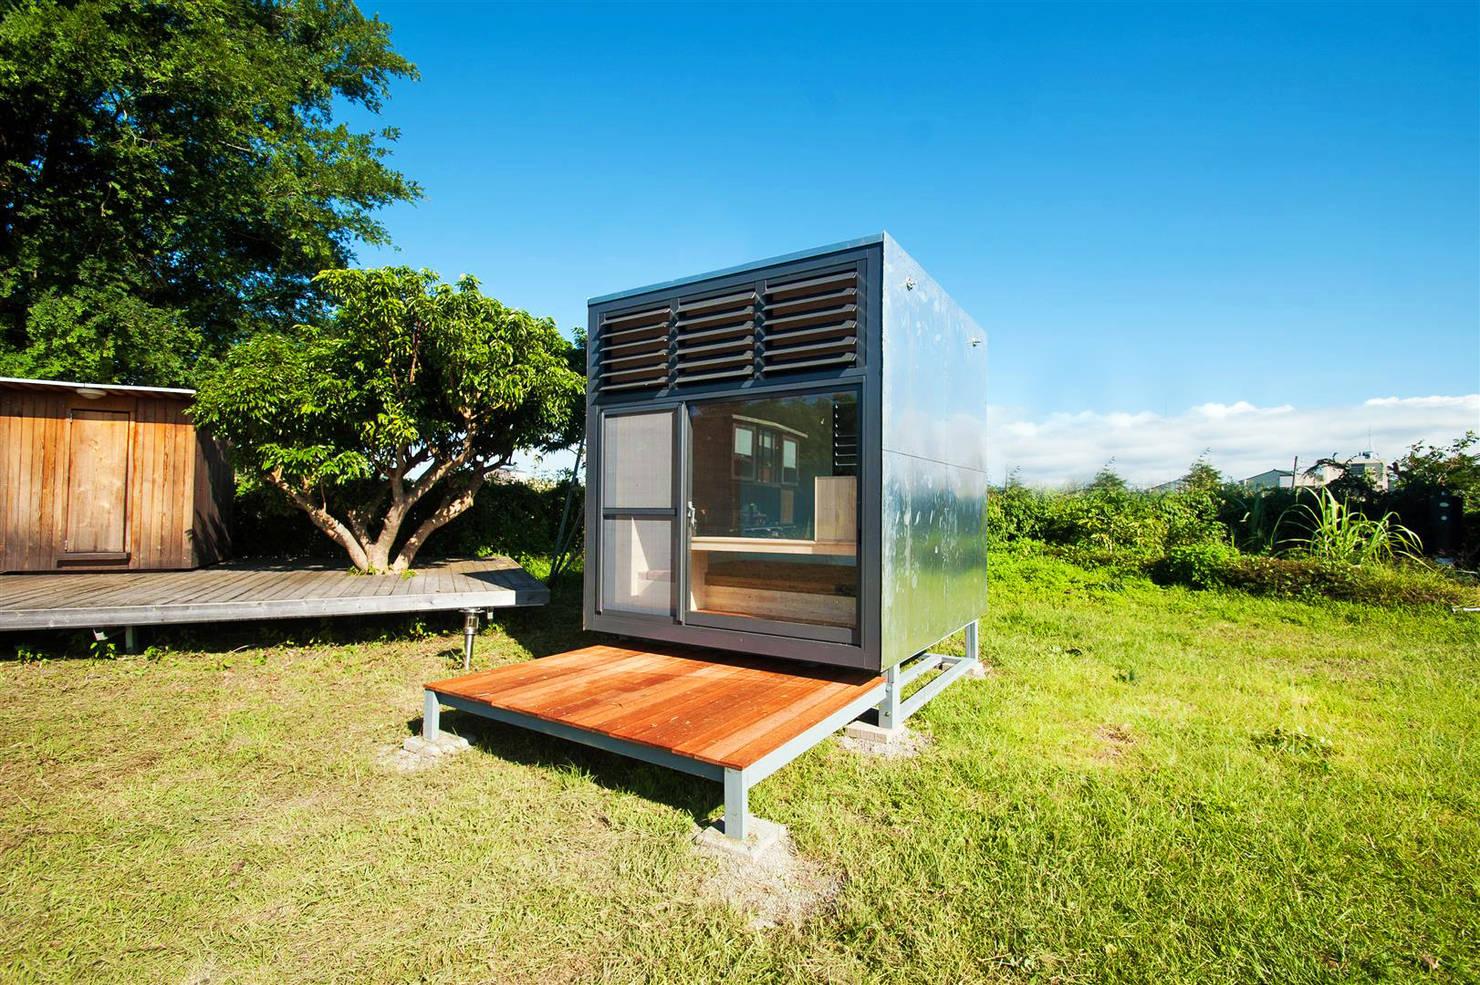 Mobiles Mini-Zuhause mit Ausblick